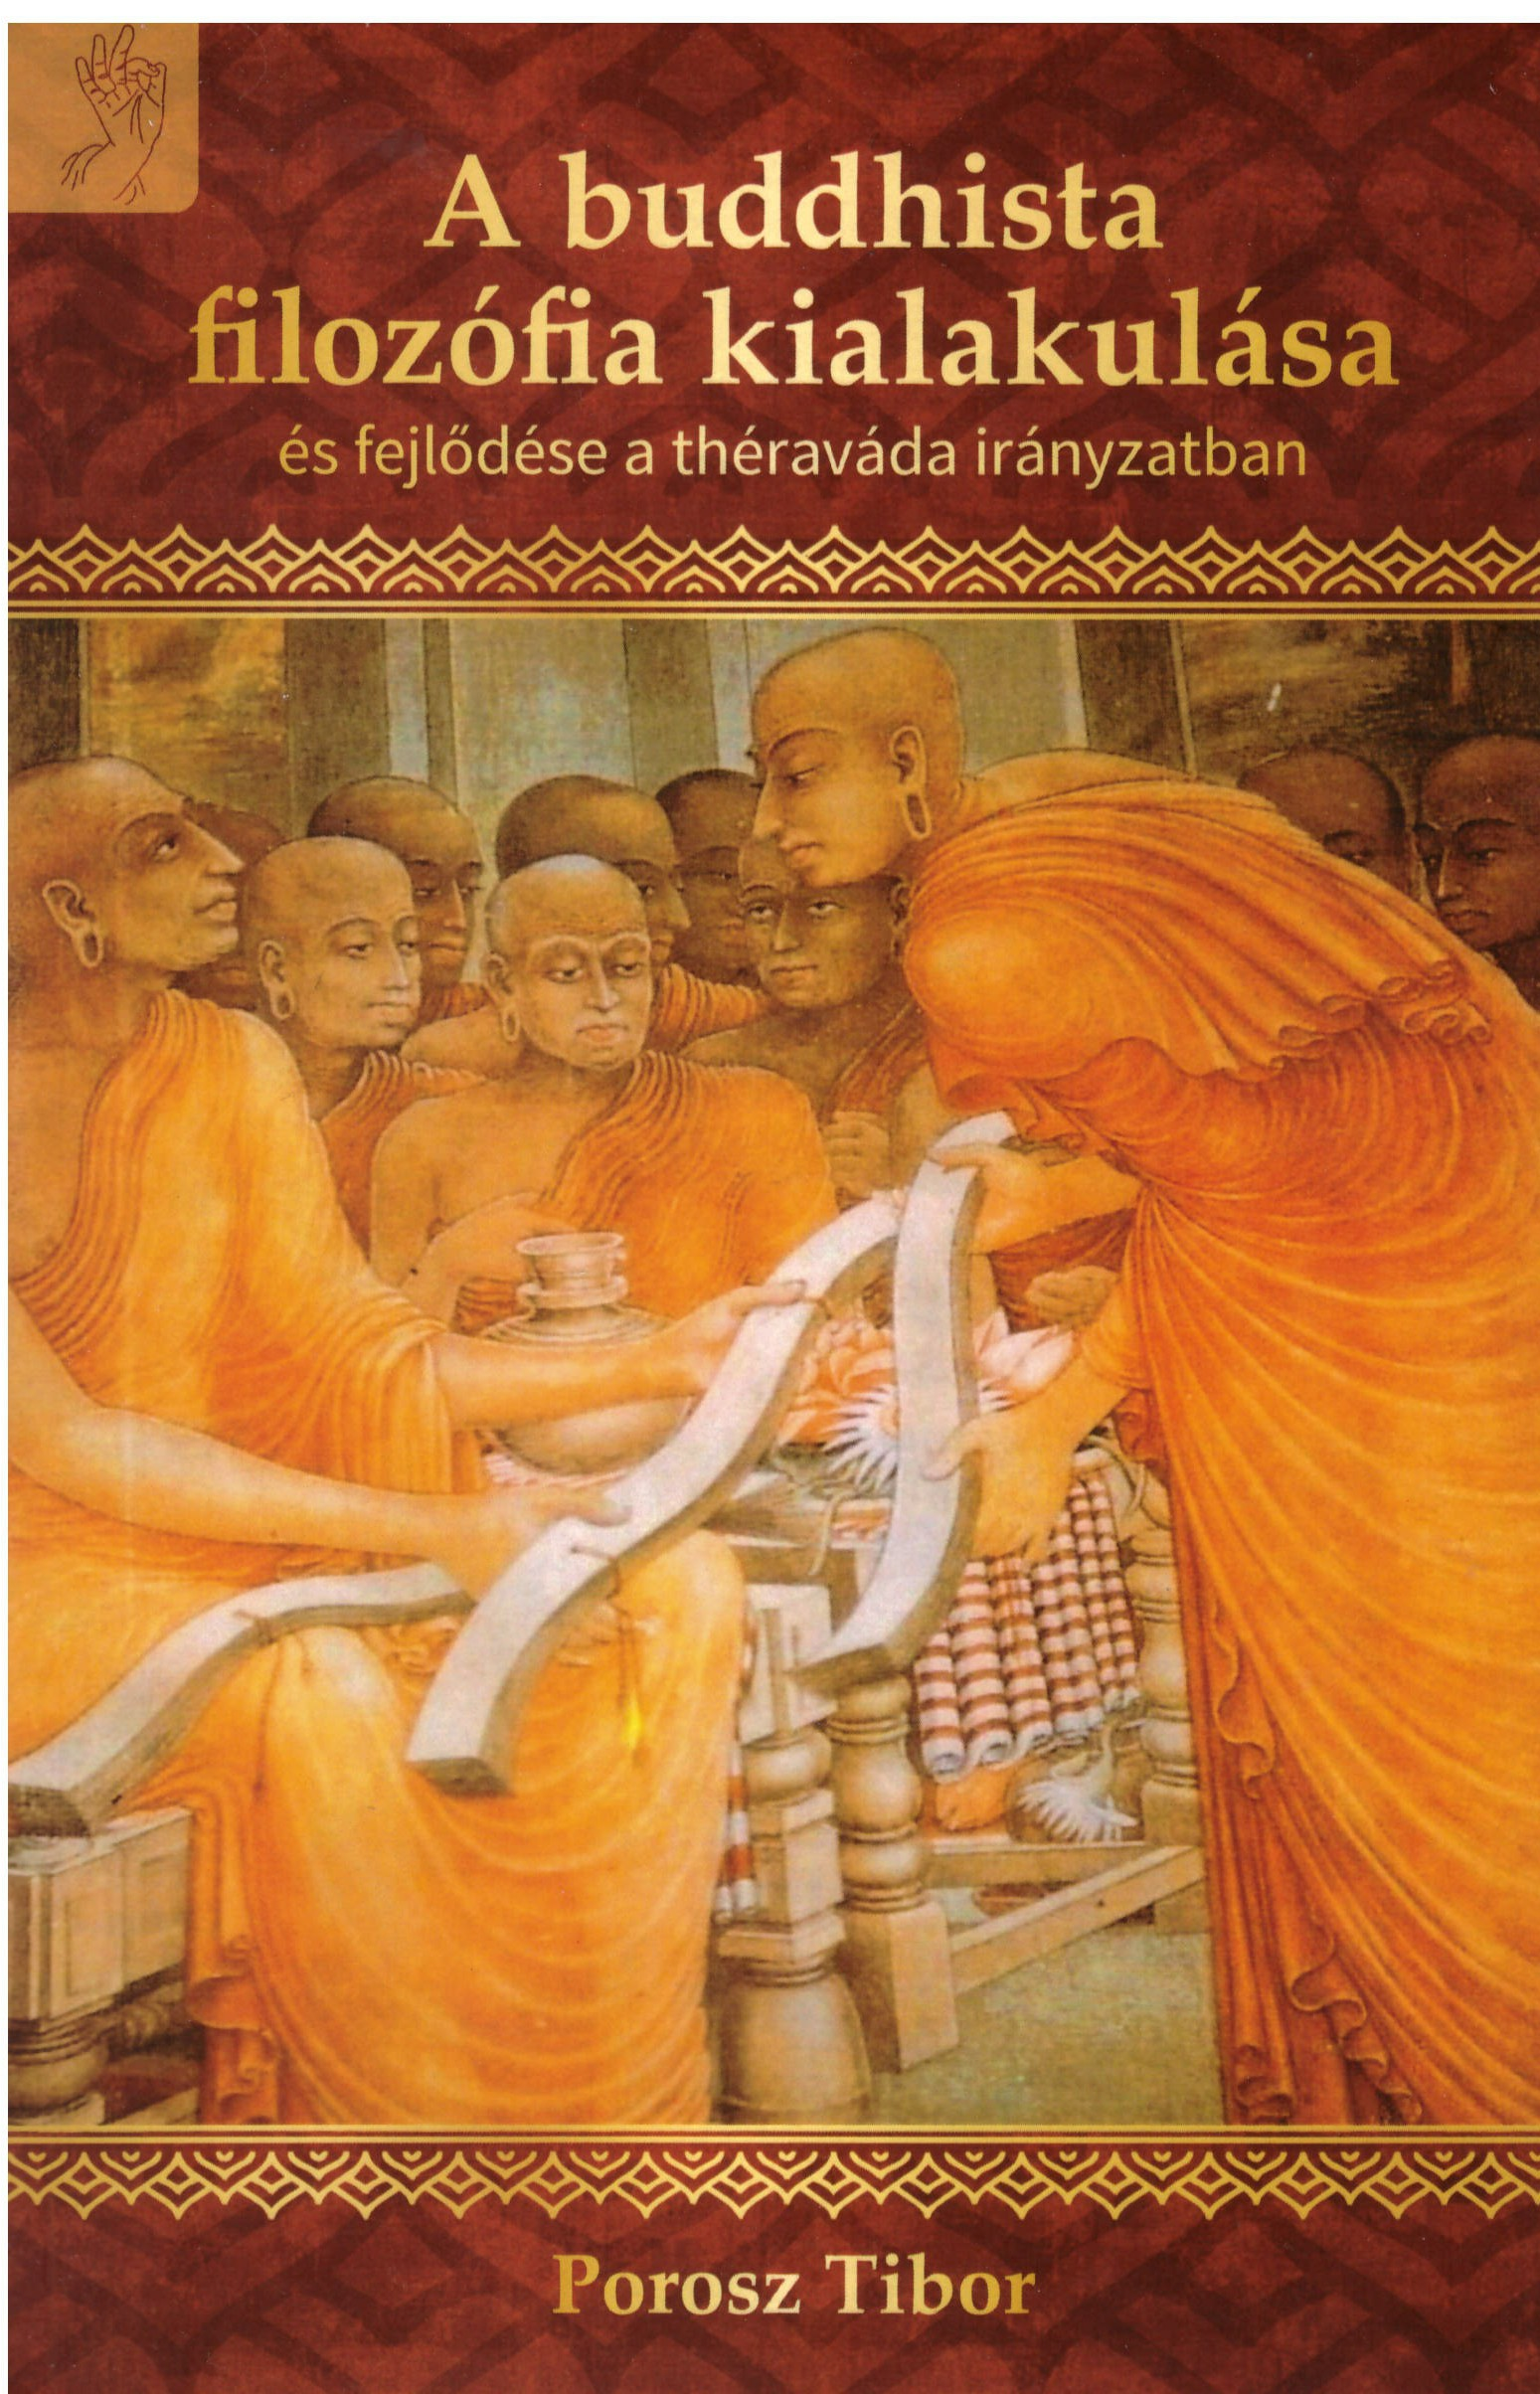 A buddhista filozófia kialakulása